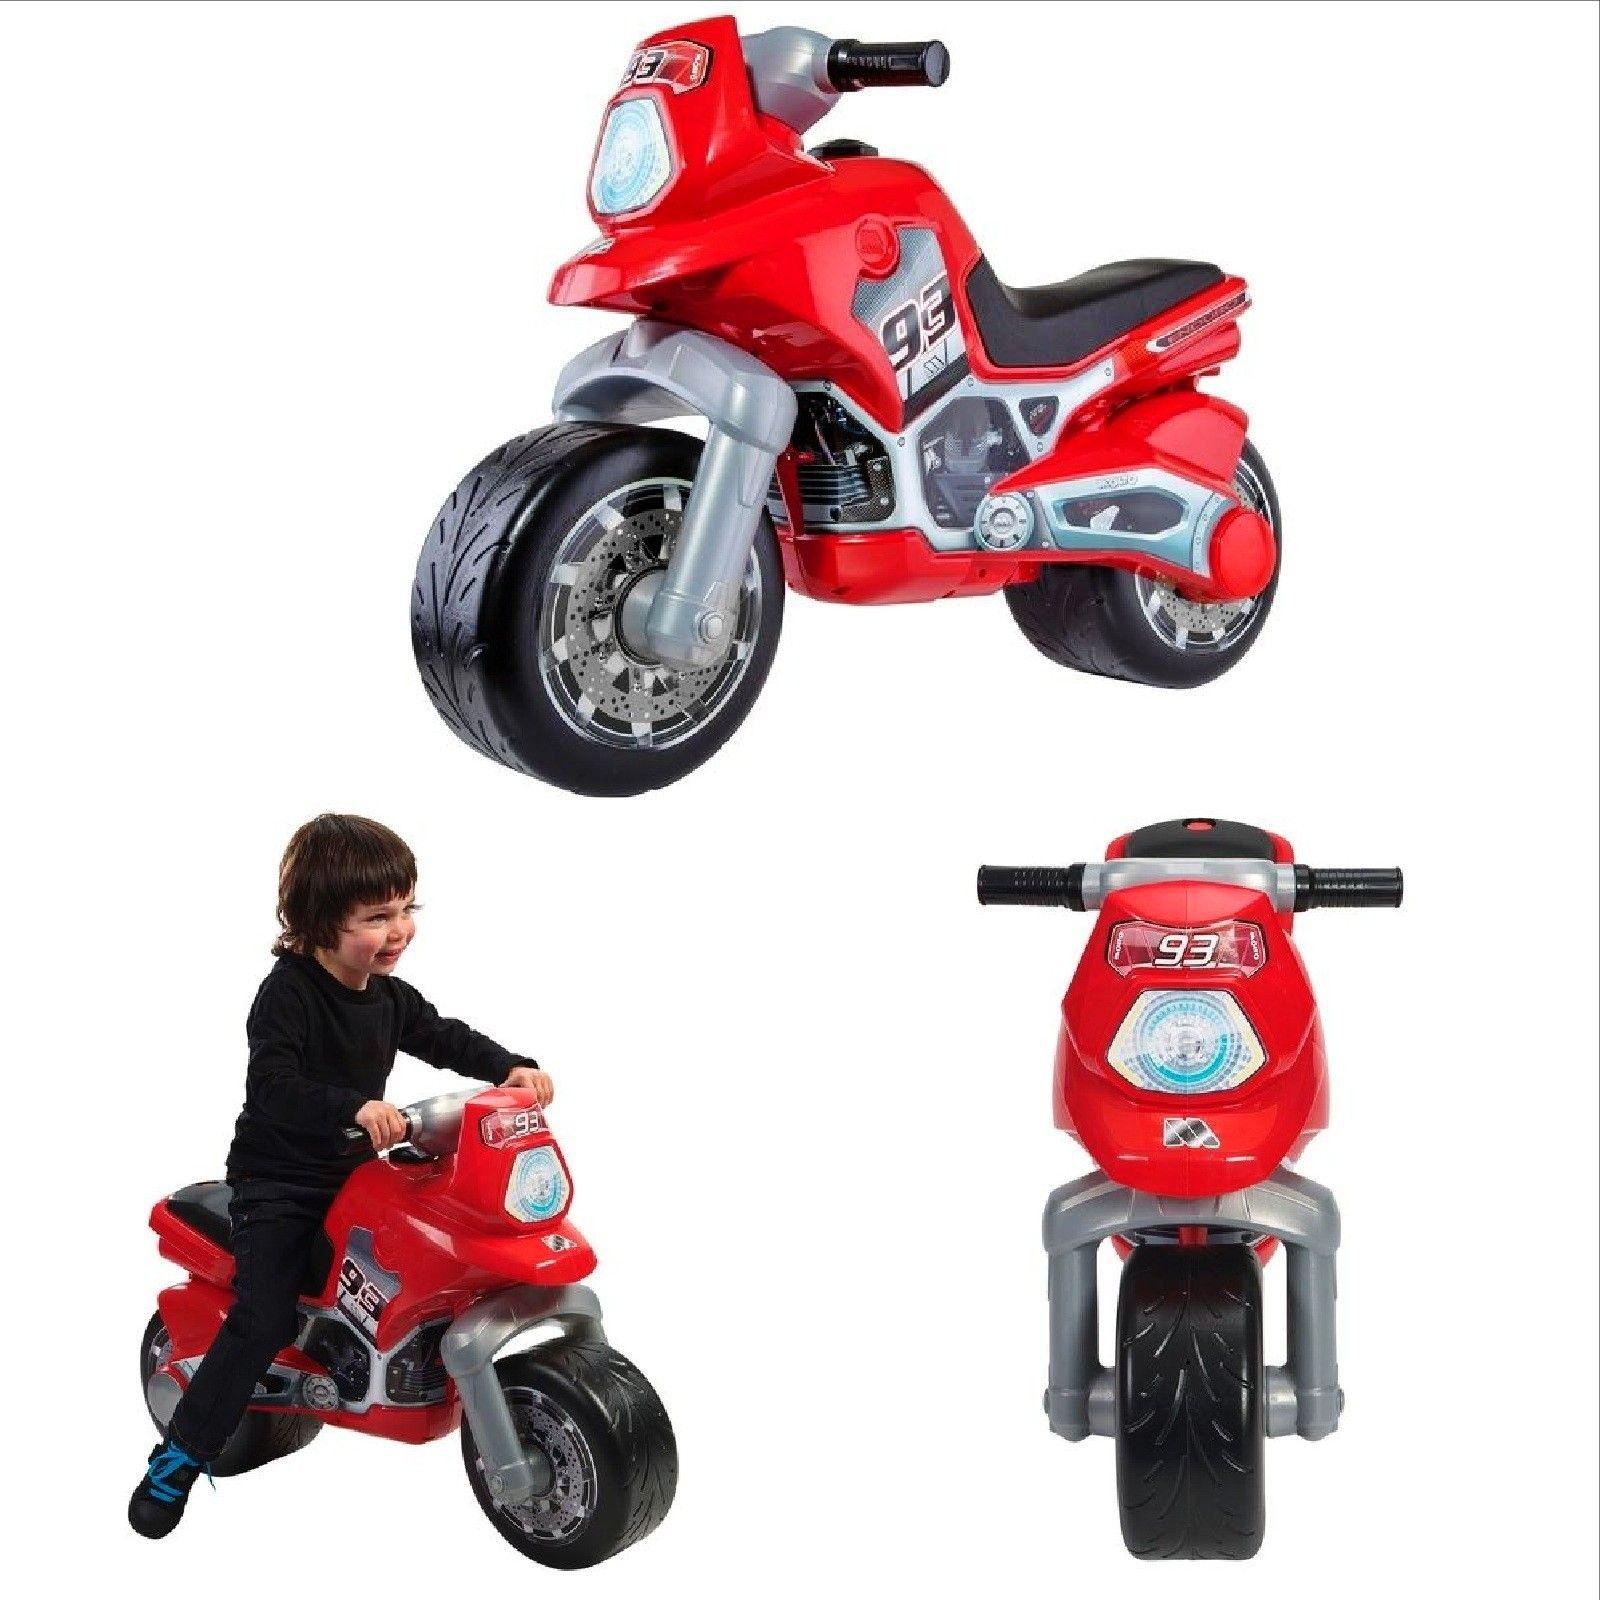 Motocross Kids Motorbike Ride On Motorcycle Boys Toy Wheeled Hard ...